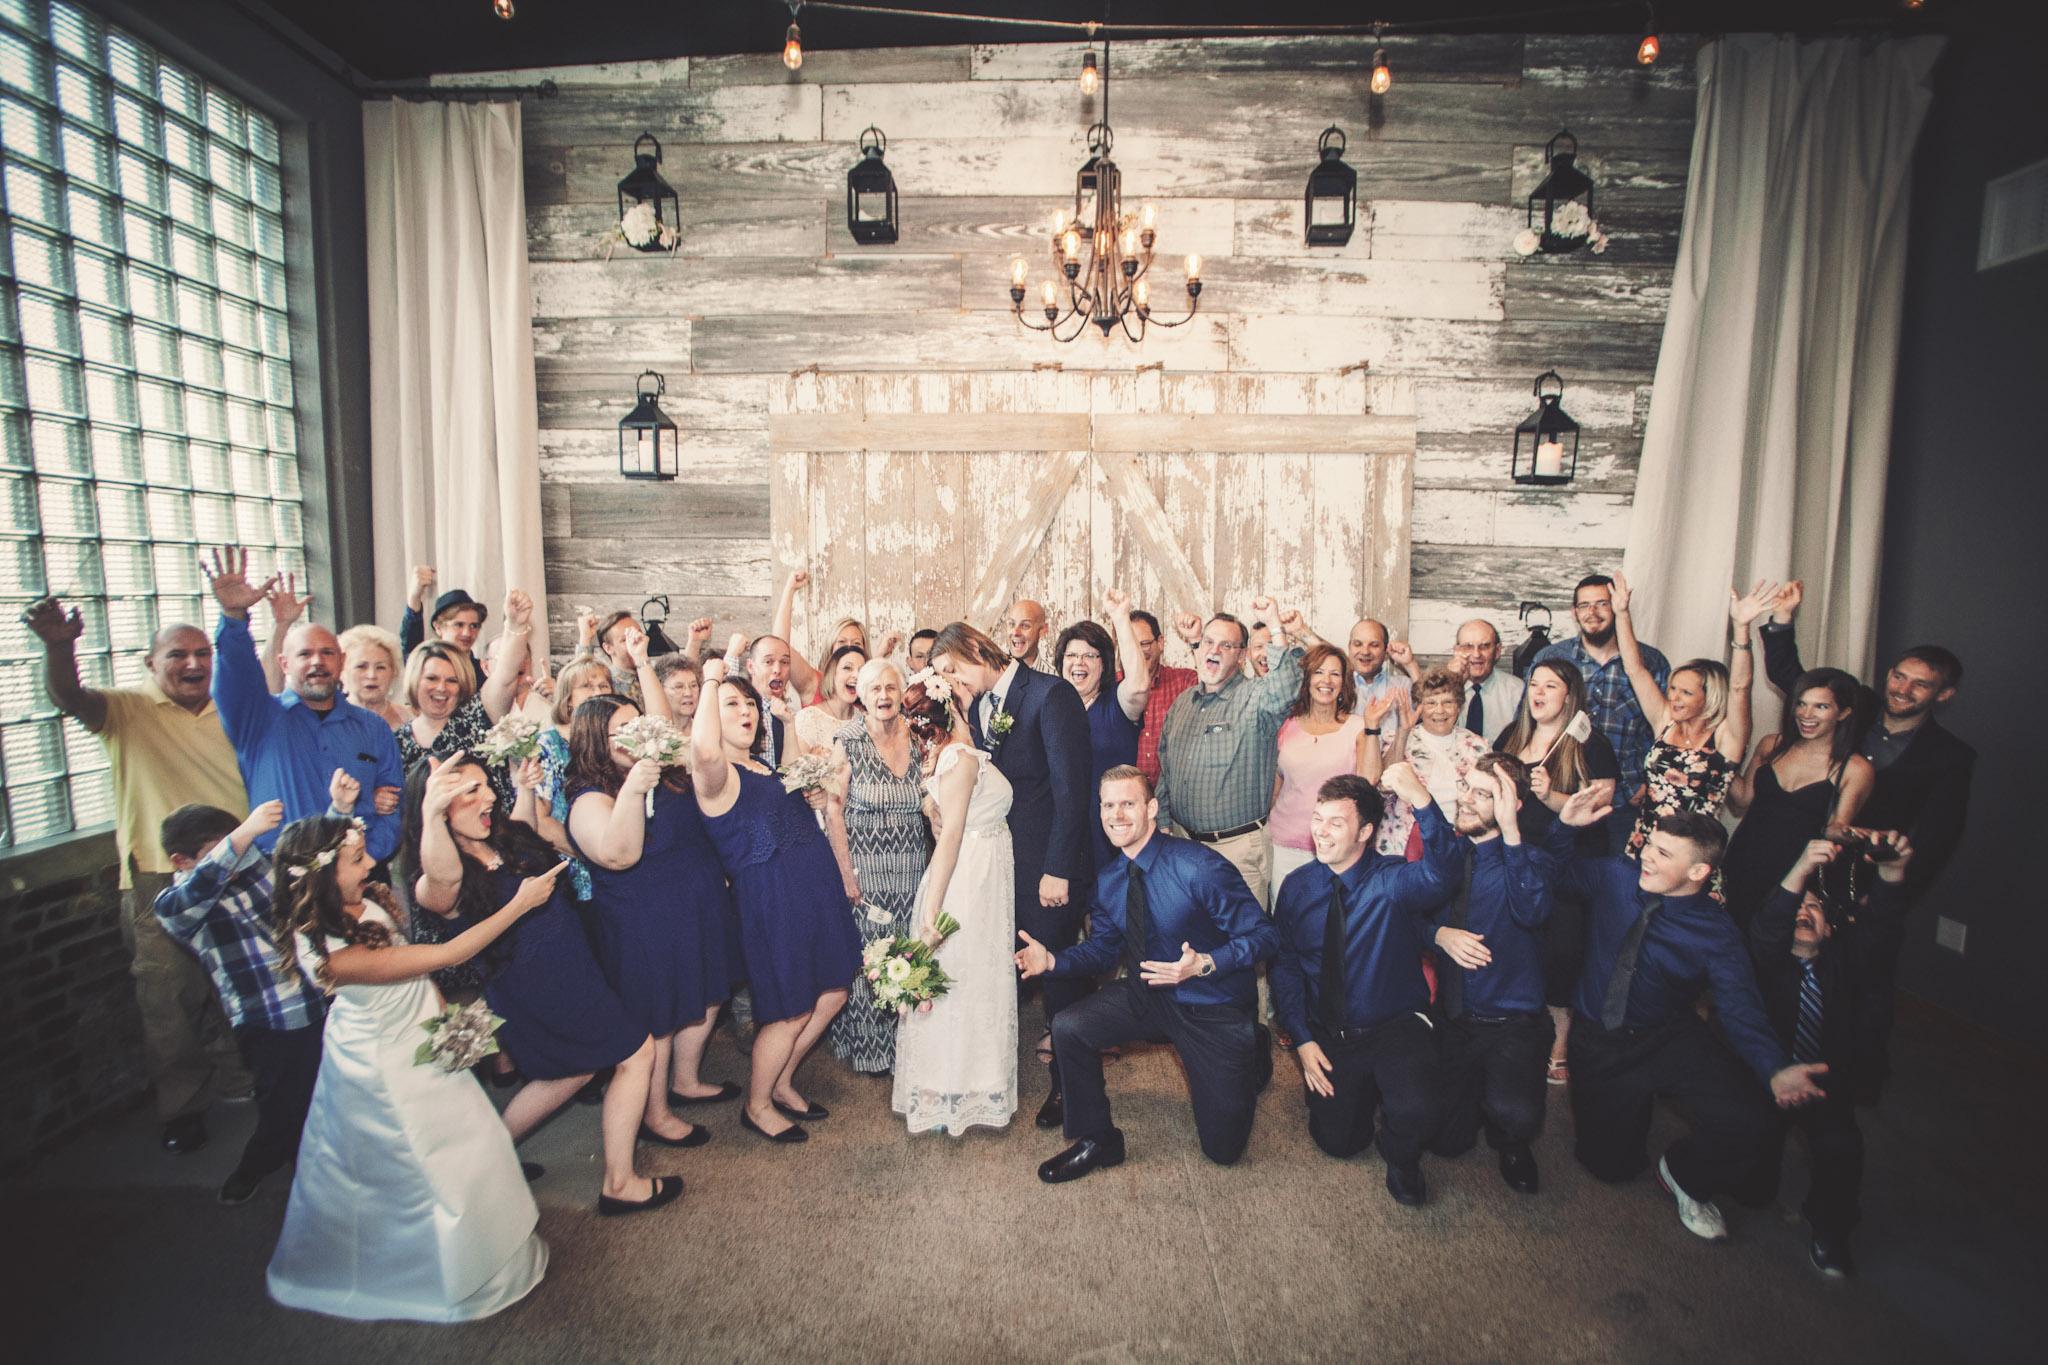 Kansas_City_Small_Wedding_Venue_Elope_Intimate_Ceremony_Budget_Affordable_Sophie&Philip_158b.jpg